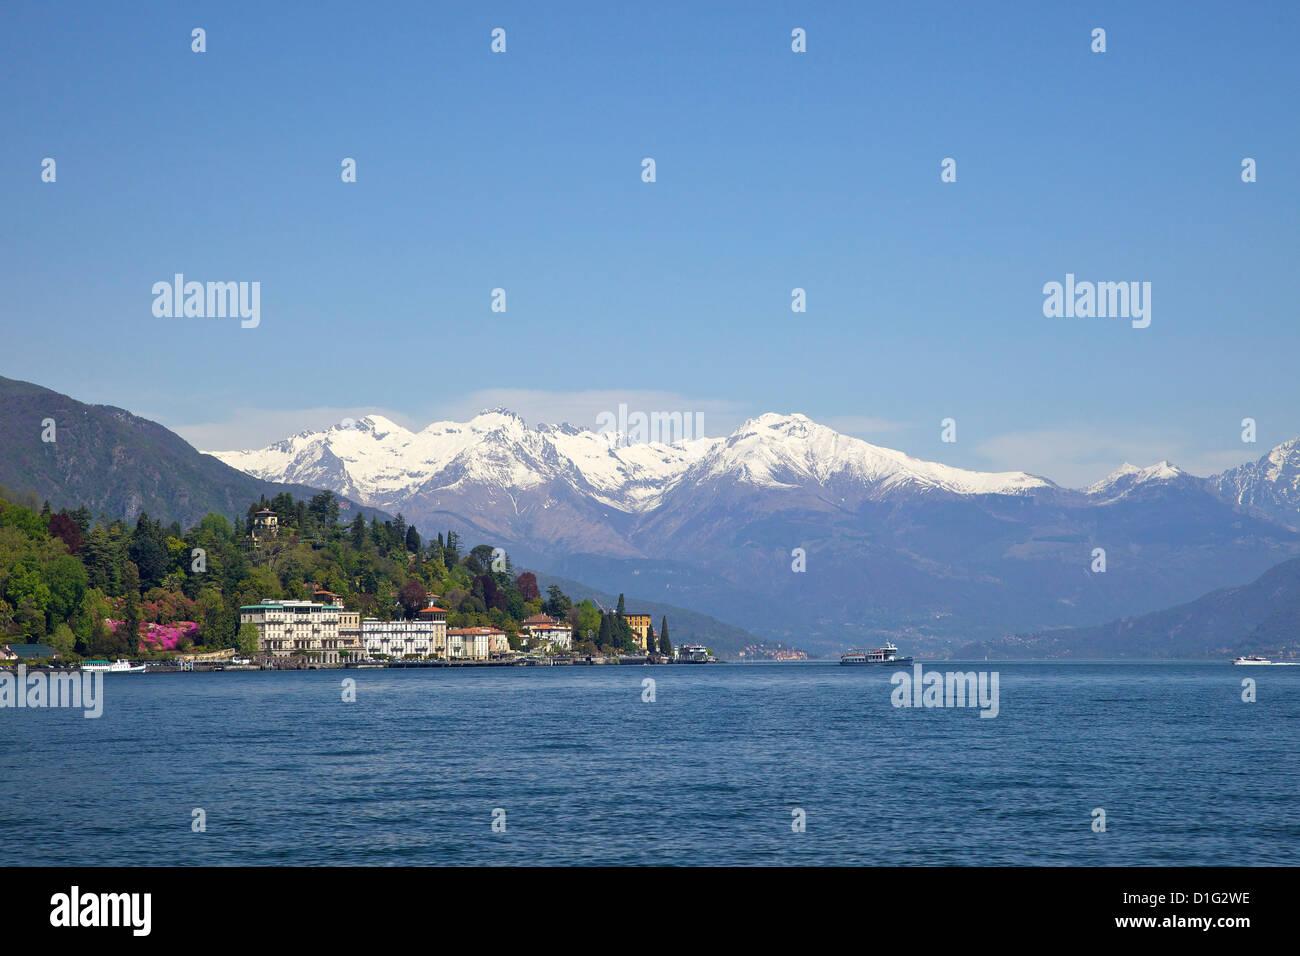 Grand Hotel, Cadenabbia in spring sunshine, Lake Como, Lombardy, Italian Lakes, Italy, Europe - Stock Image